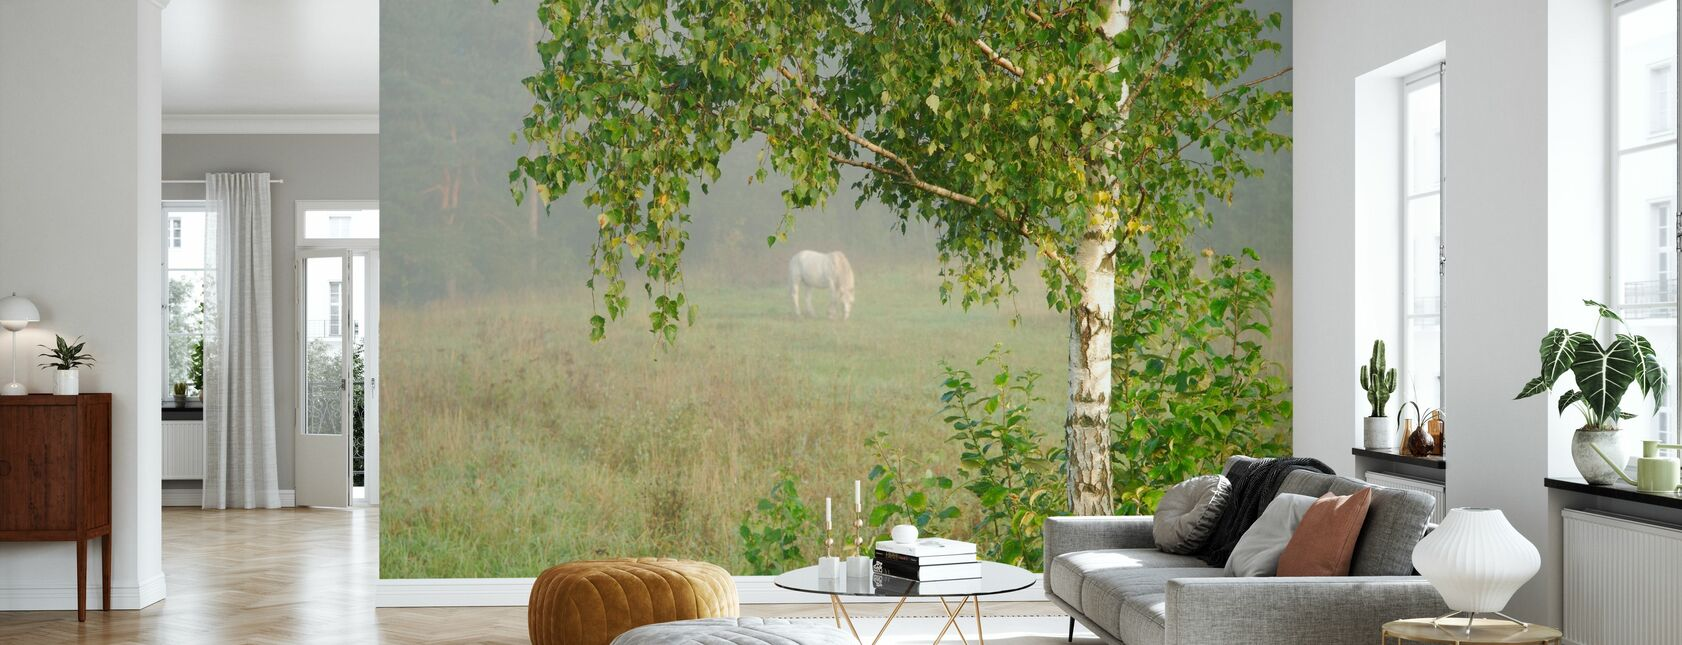 Pasture - Wallpaper - Living Room